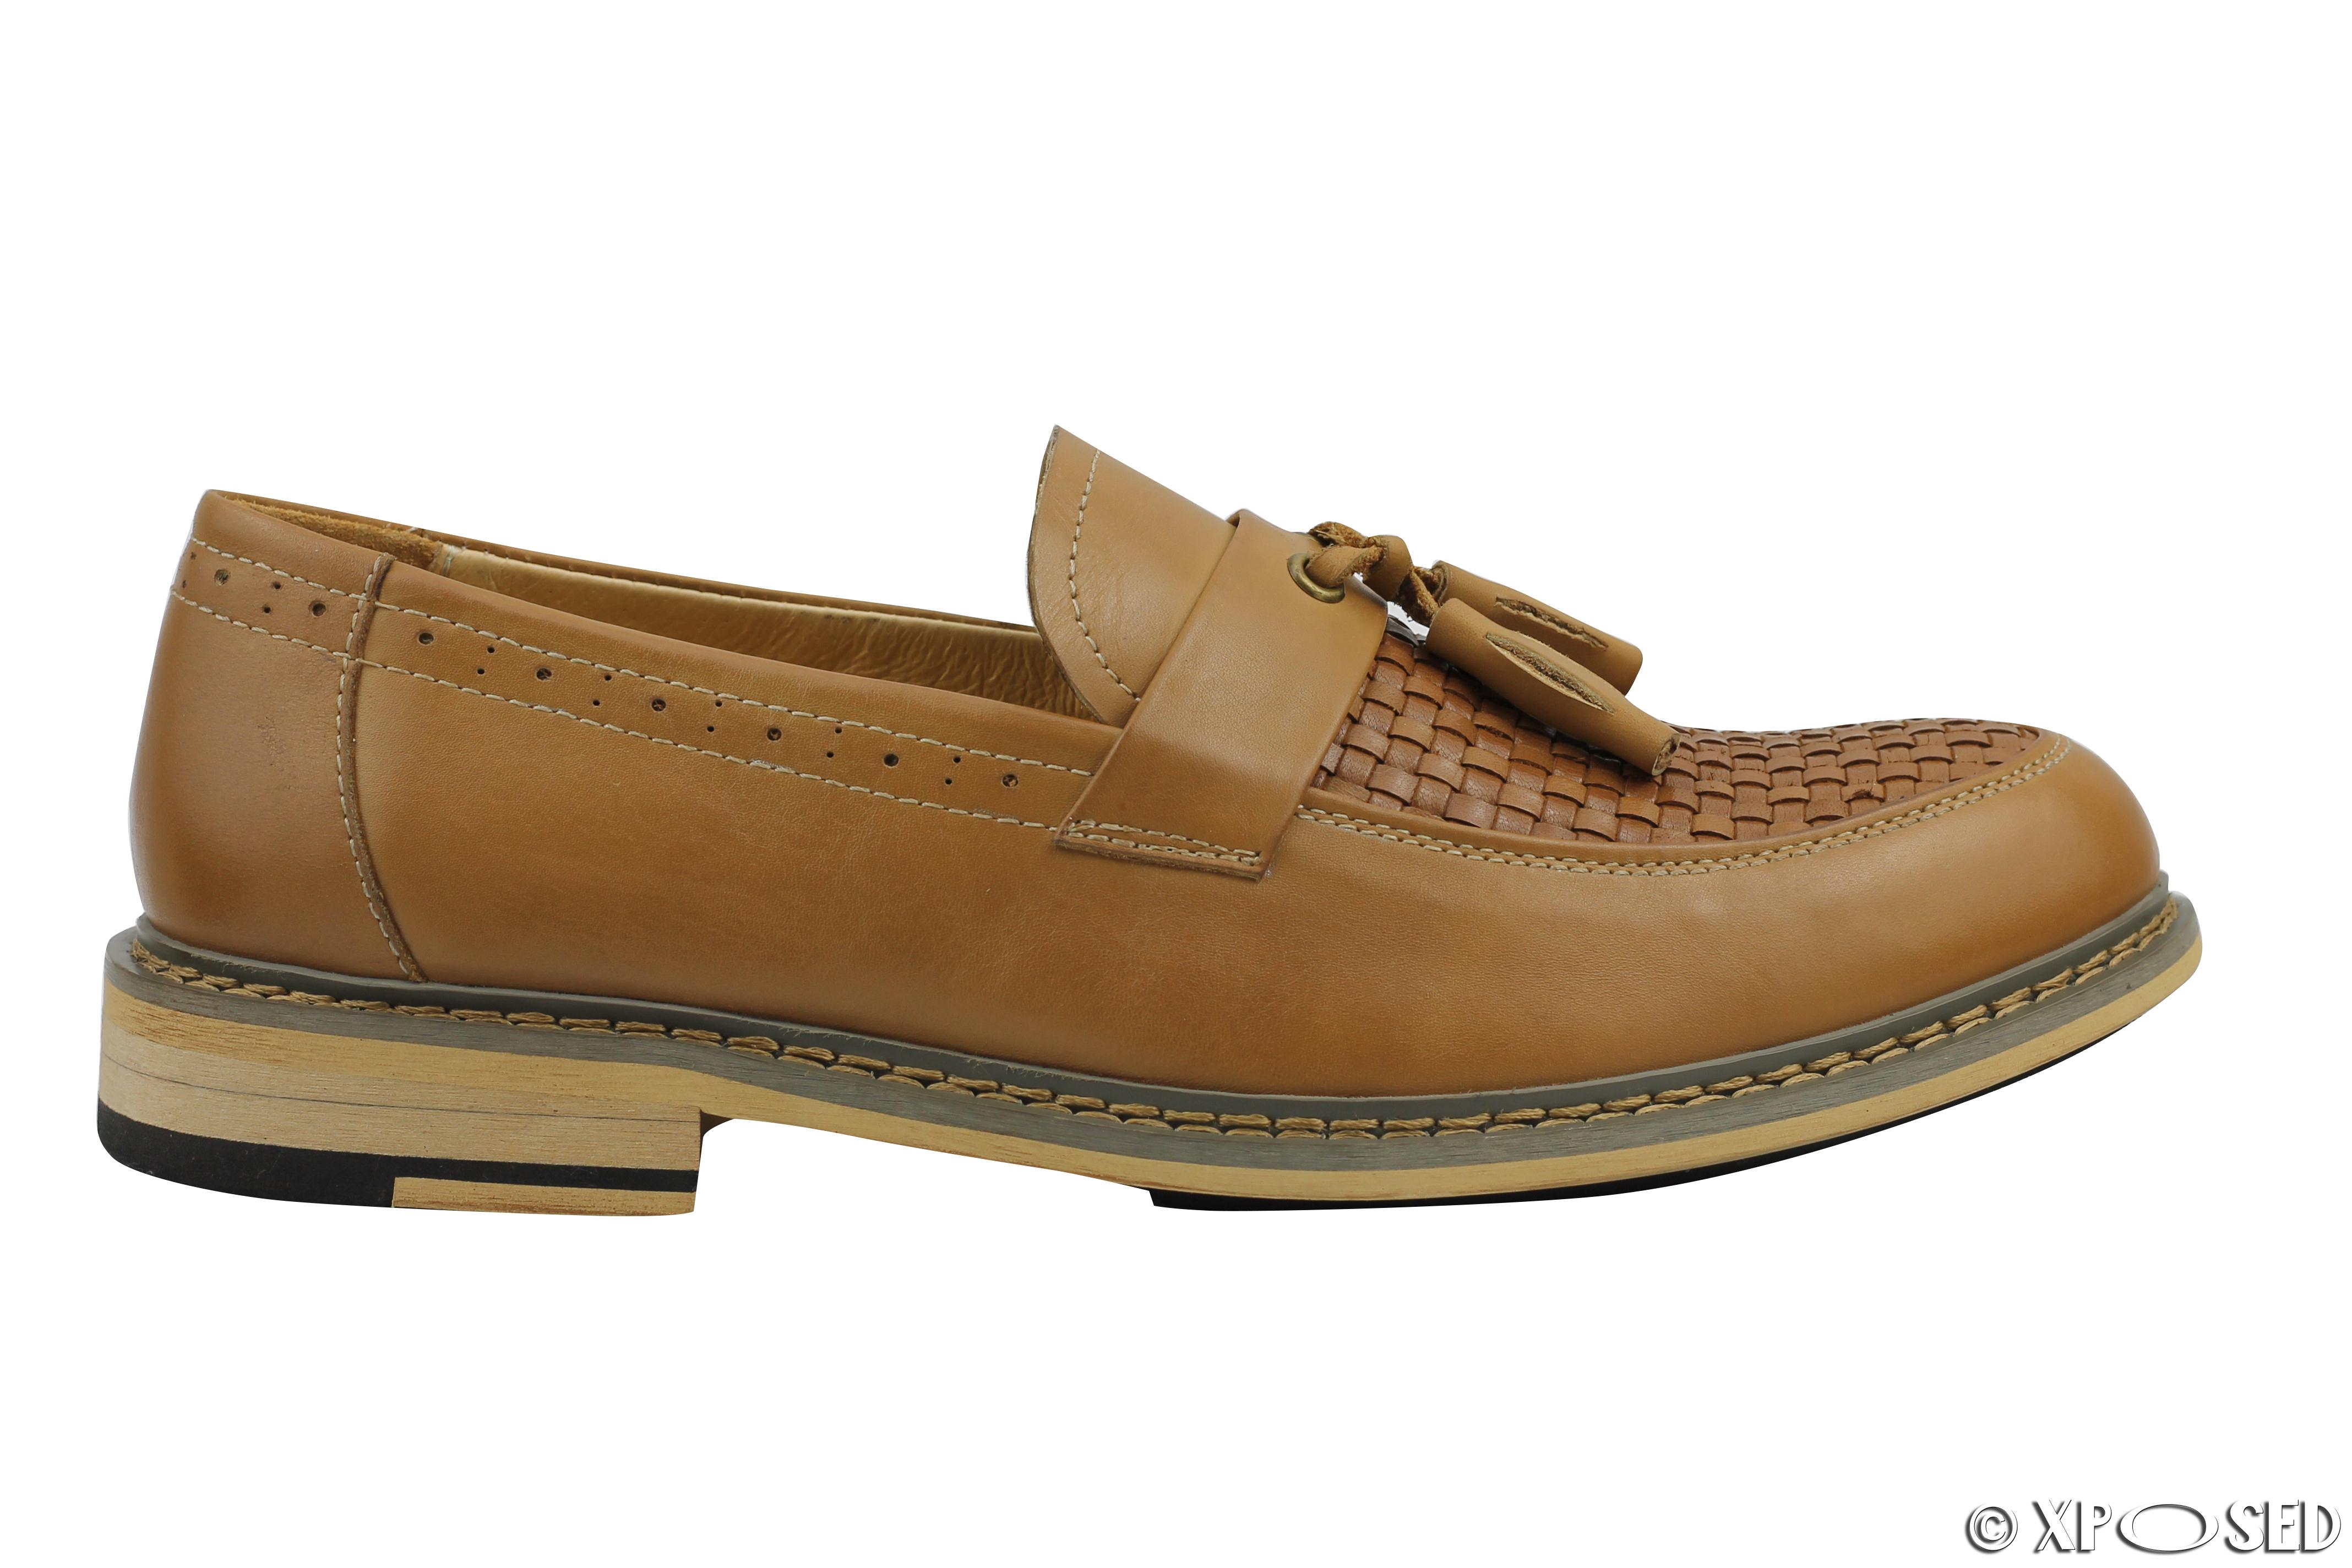 8218c67e403 ylw6888zong44 SUNROLAN Santa De Lo Men s Designer Tassel. Mens Black Tan  Woven Real Leather Tassel Loafers Smart MOD